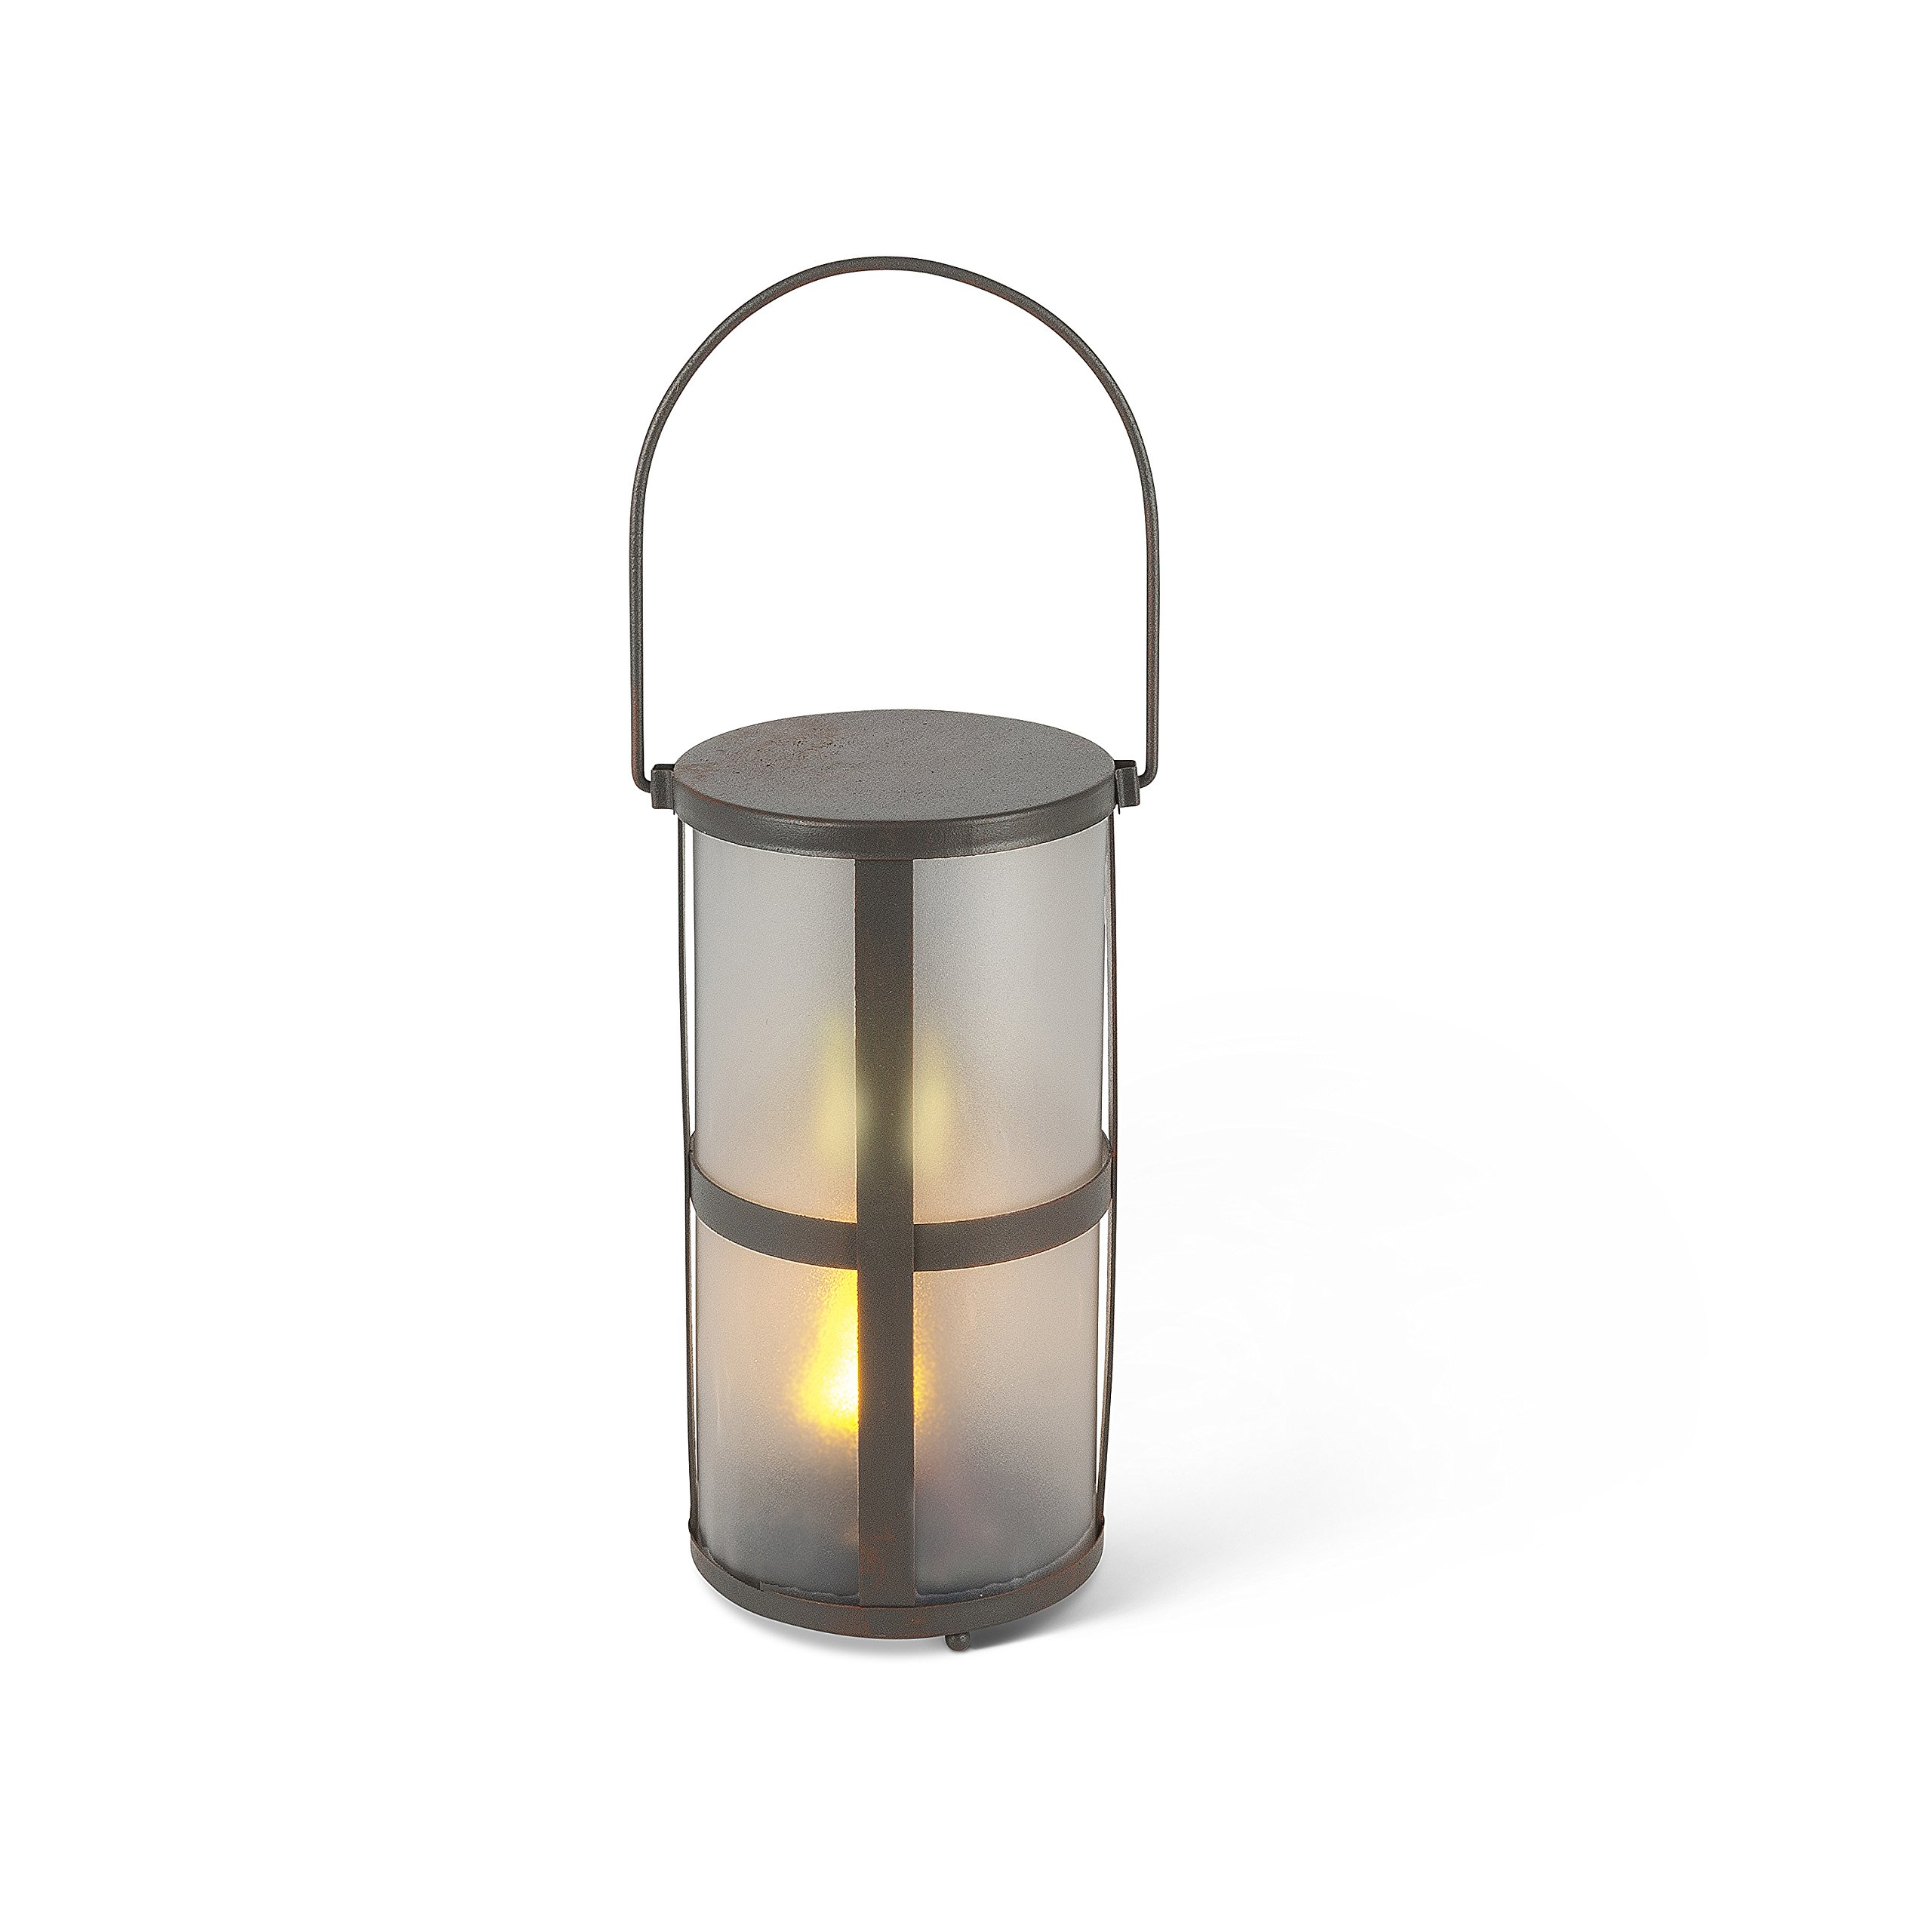 Everlasting Glow 7.87'' H Fireglow(TM) Lantern H, 3.93Inl x 3.93Inw x 7.87Inh